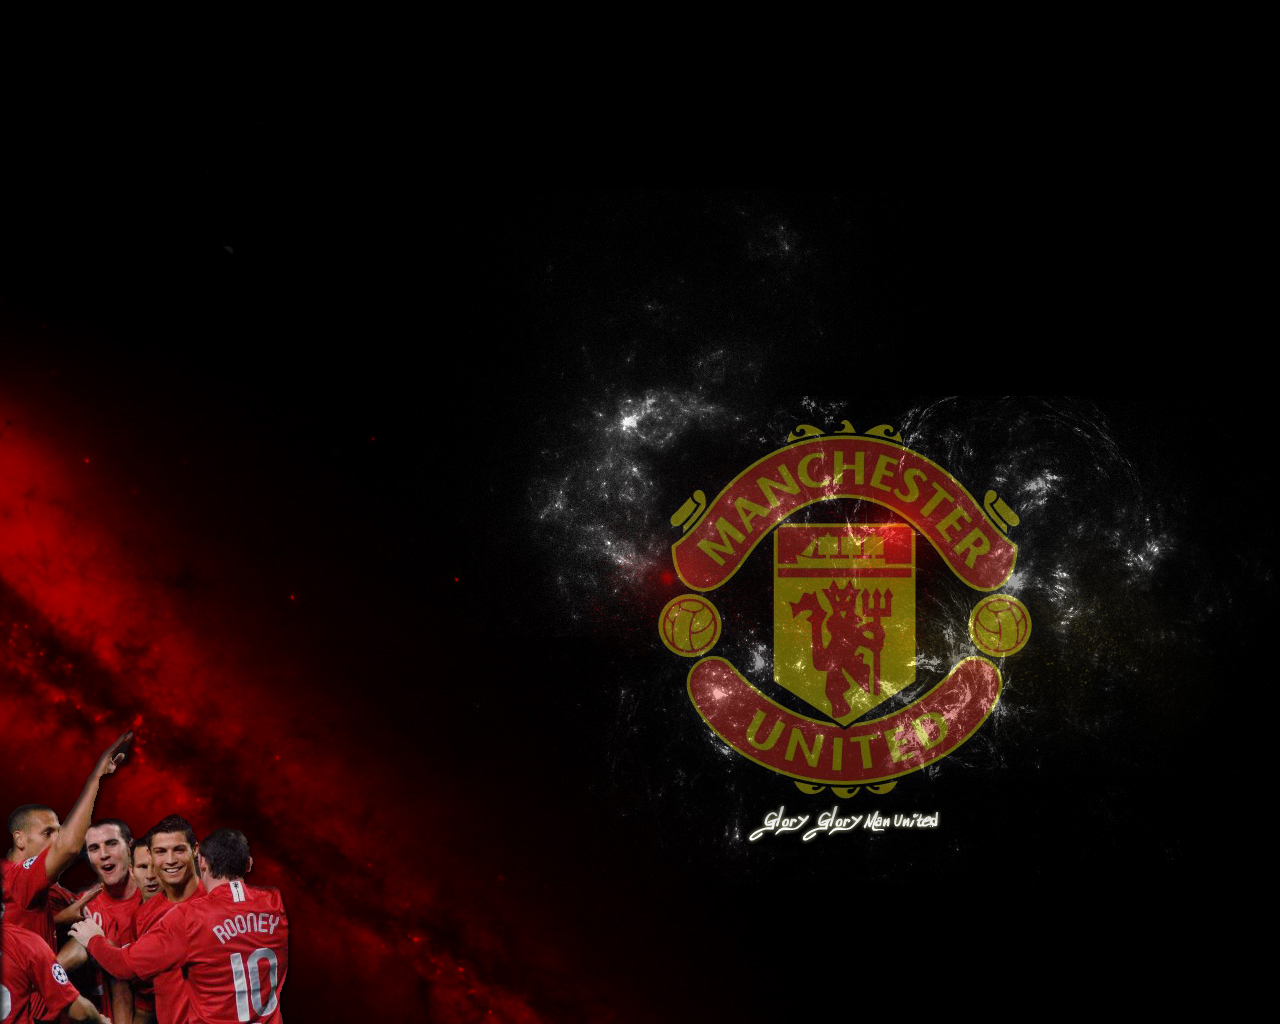 http://3.bp.blogspot.com/-sJgvs8l_kDs/Tc5KvqIeA_I/AAAAAAAABf0/W5I20QweDtw/s1600/Manchester-United-manchester-united-12537196-1280-1024.jpg